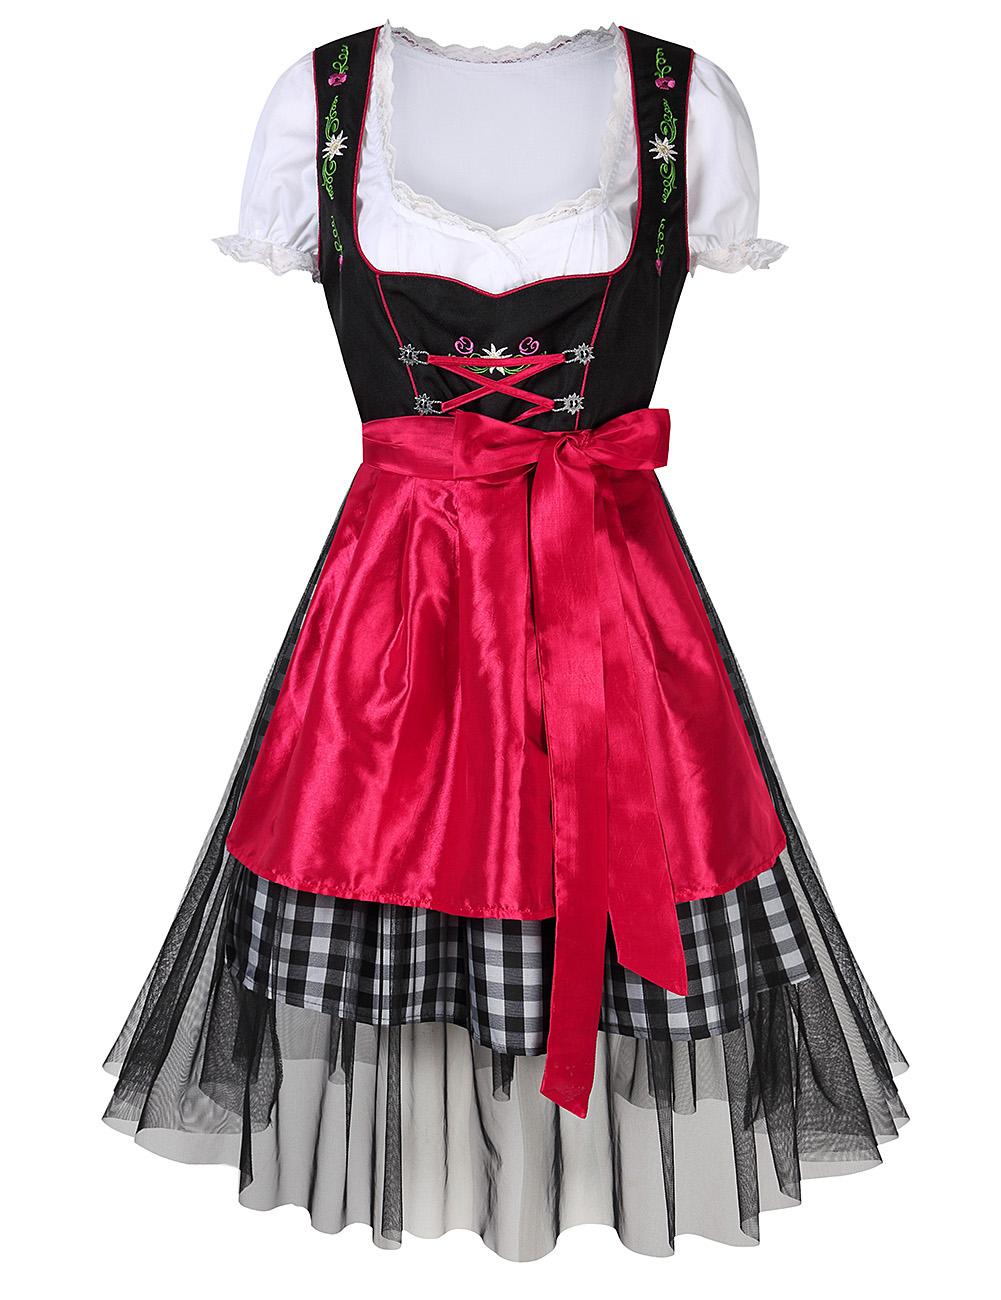 Women's Oktoberfest Plaid Mesh Stitching Embroidery A Line Formal Dresses Suit